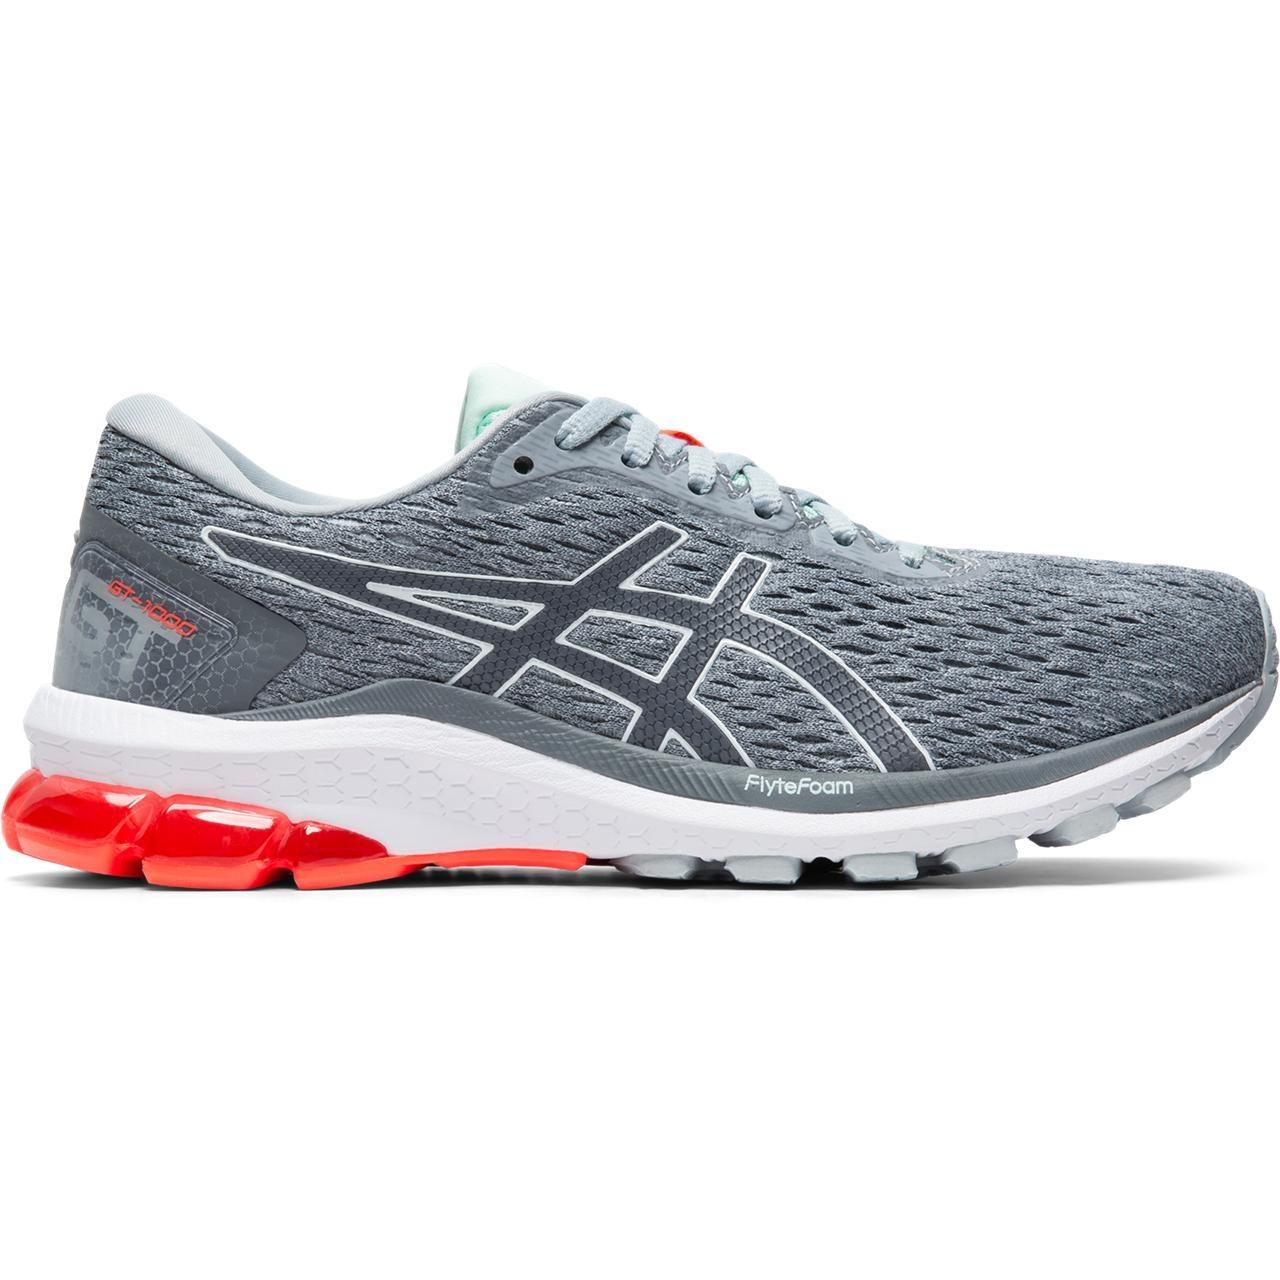 ASICS ASICS 1012A651 021 GT 1000 9 Piedmont Grey Metropolis Women's Running Shoes (Size 6 US)